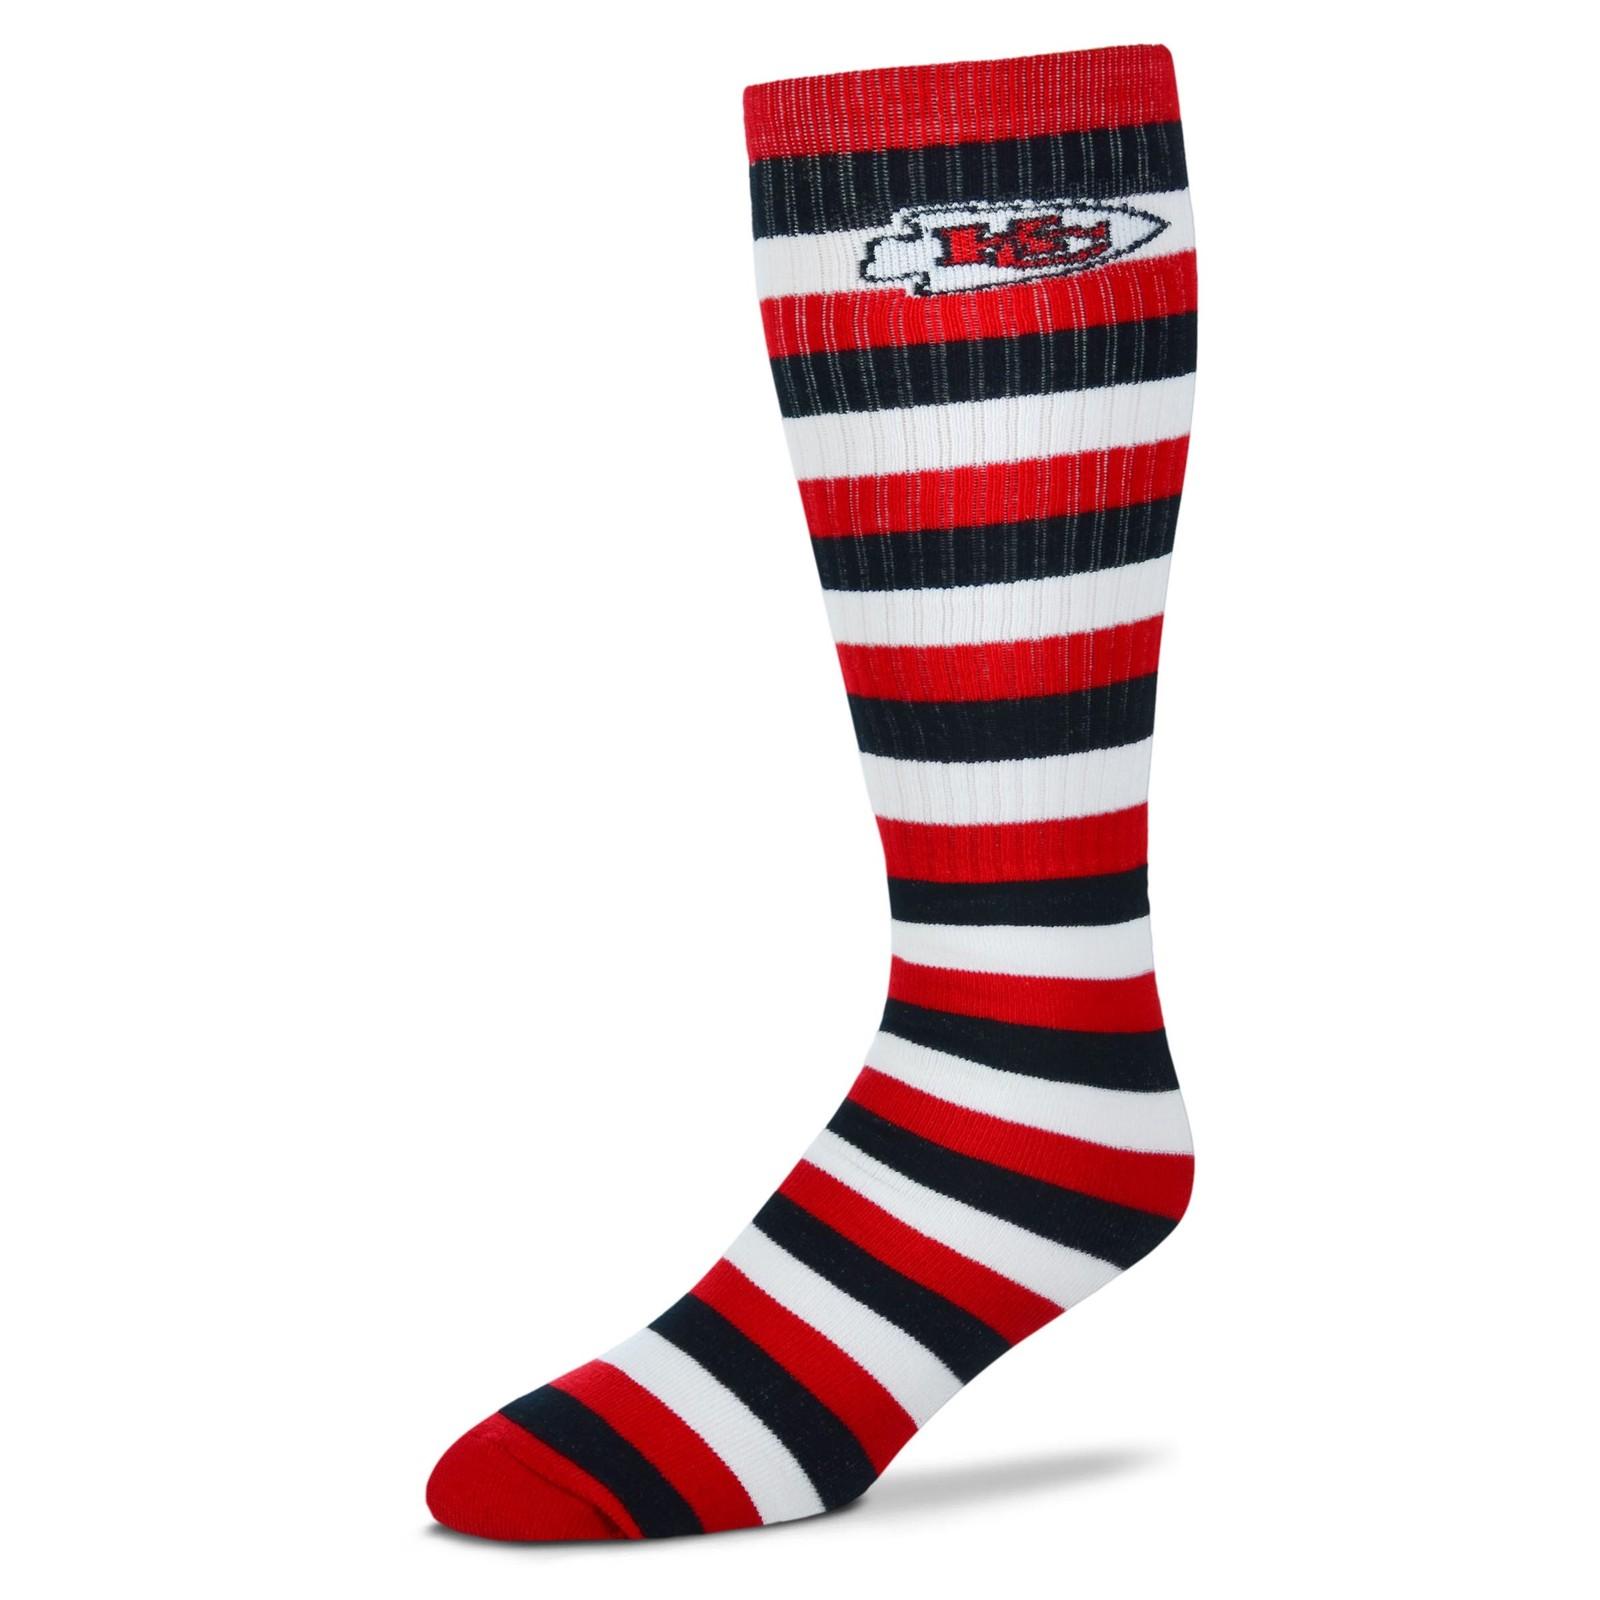 NFL Kansas City Chiefs Striped Knee High Hi Tube Socks One Size Fits Most Adults